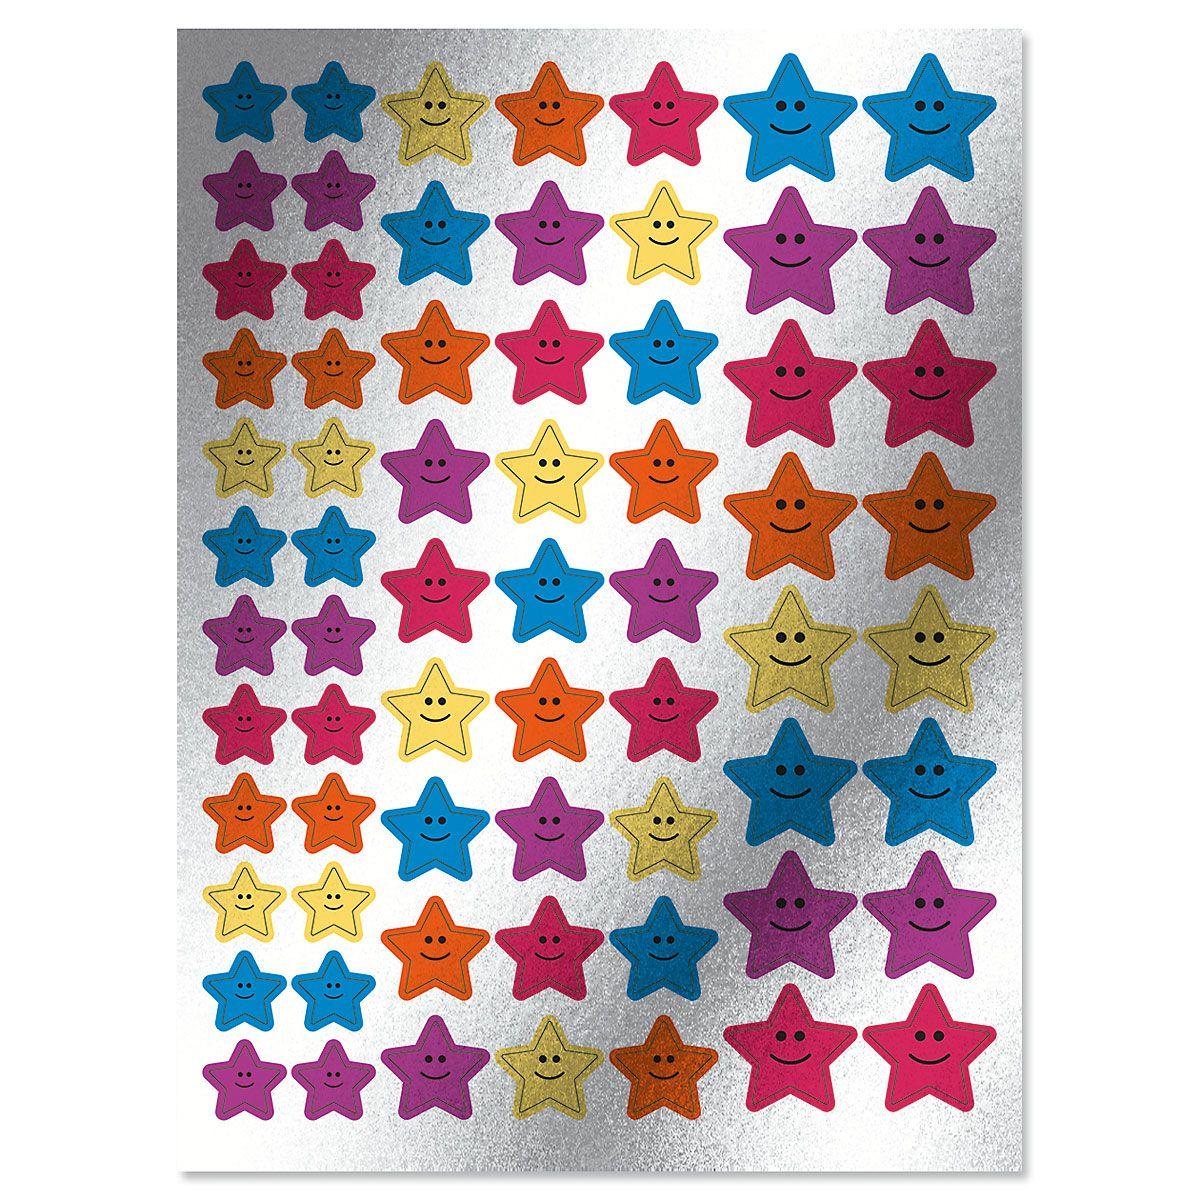 Smiling Motivational Star Foil Stickers